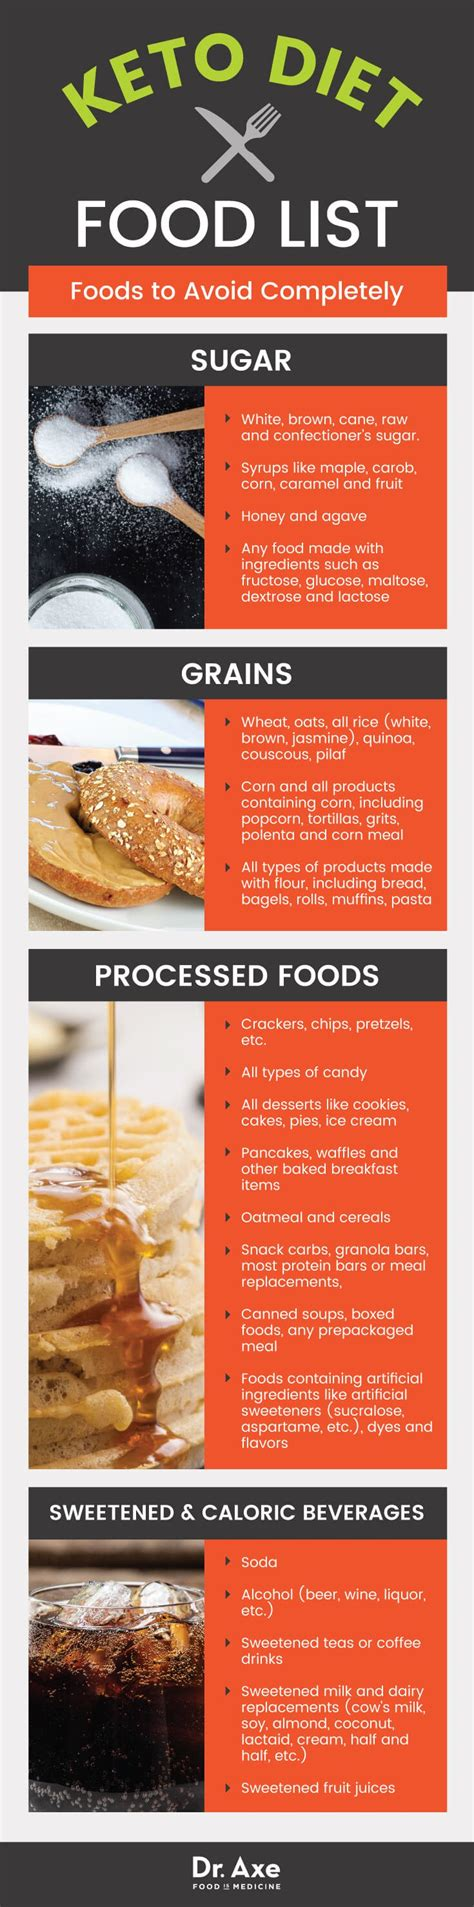 dr cuisine ketosis food list foodfash co